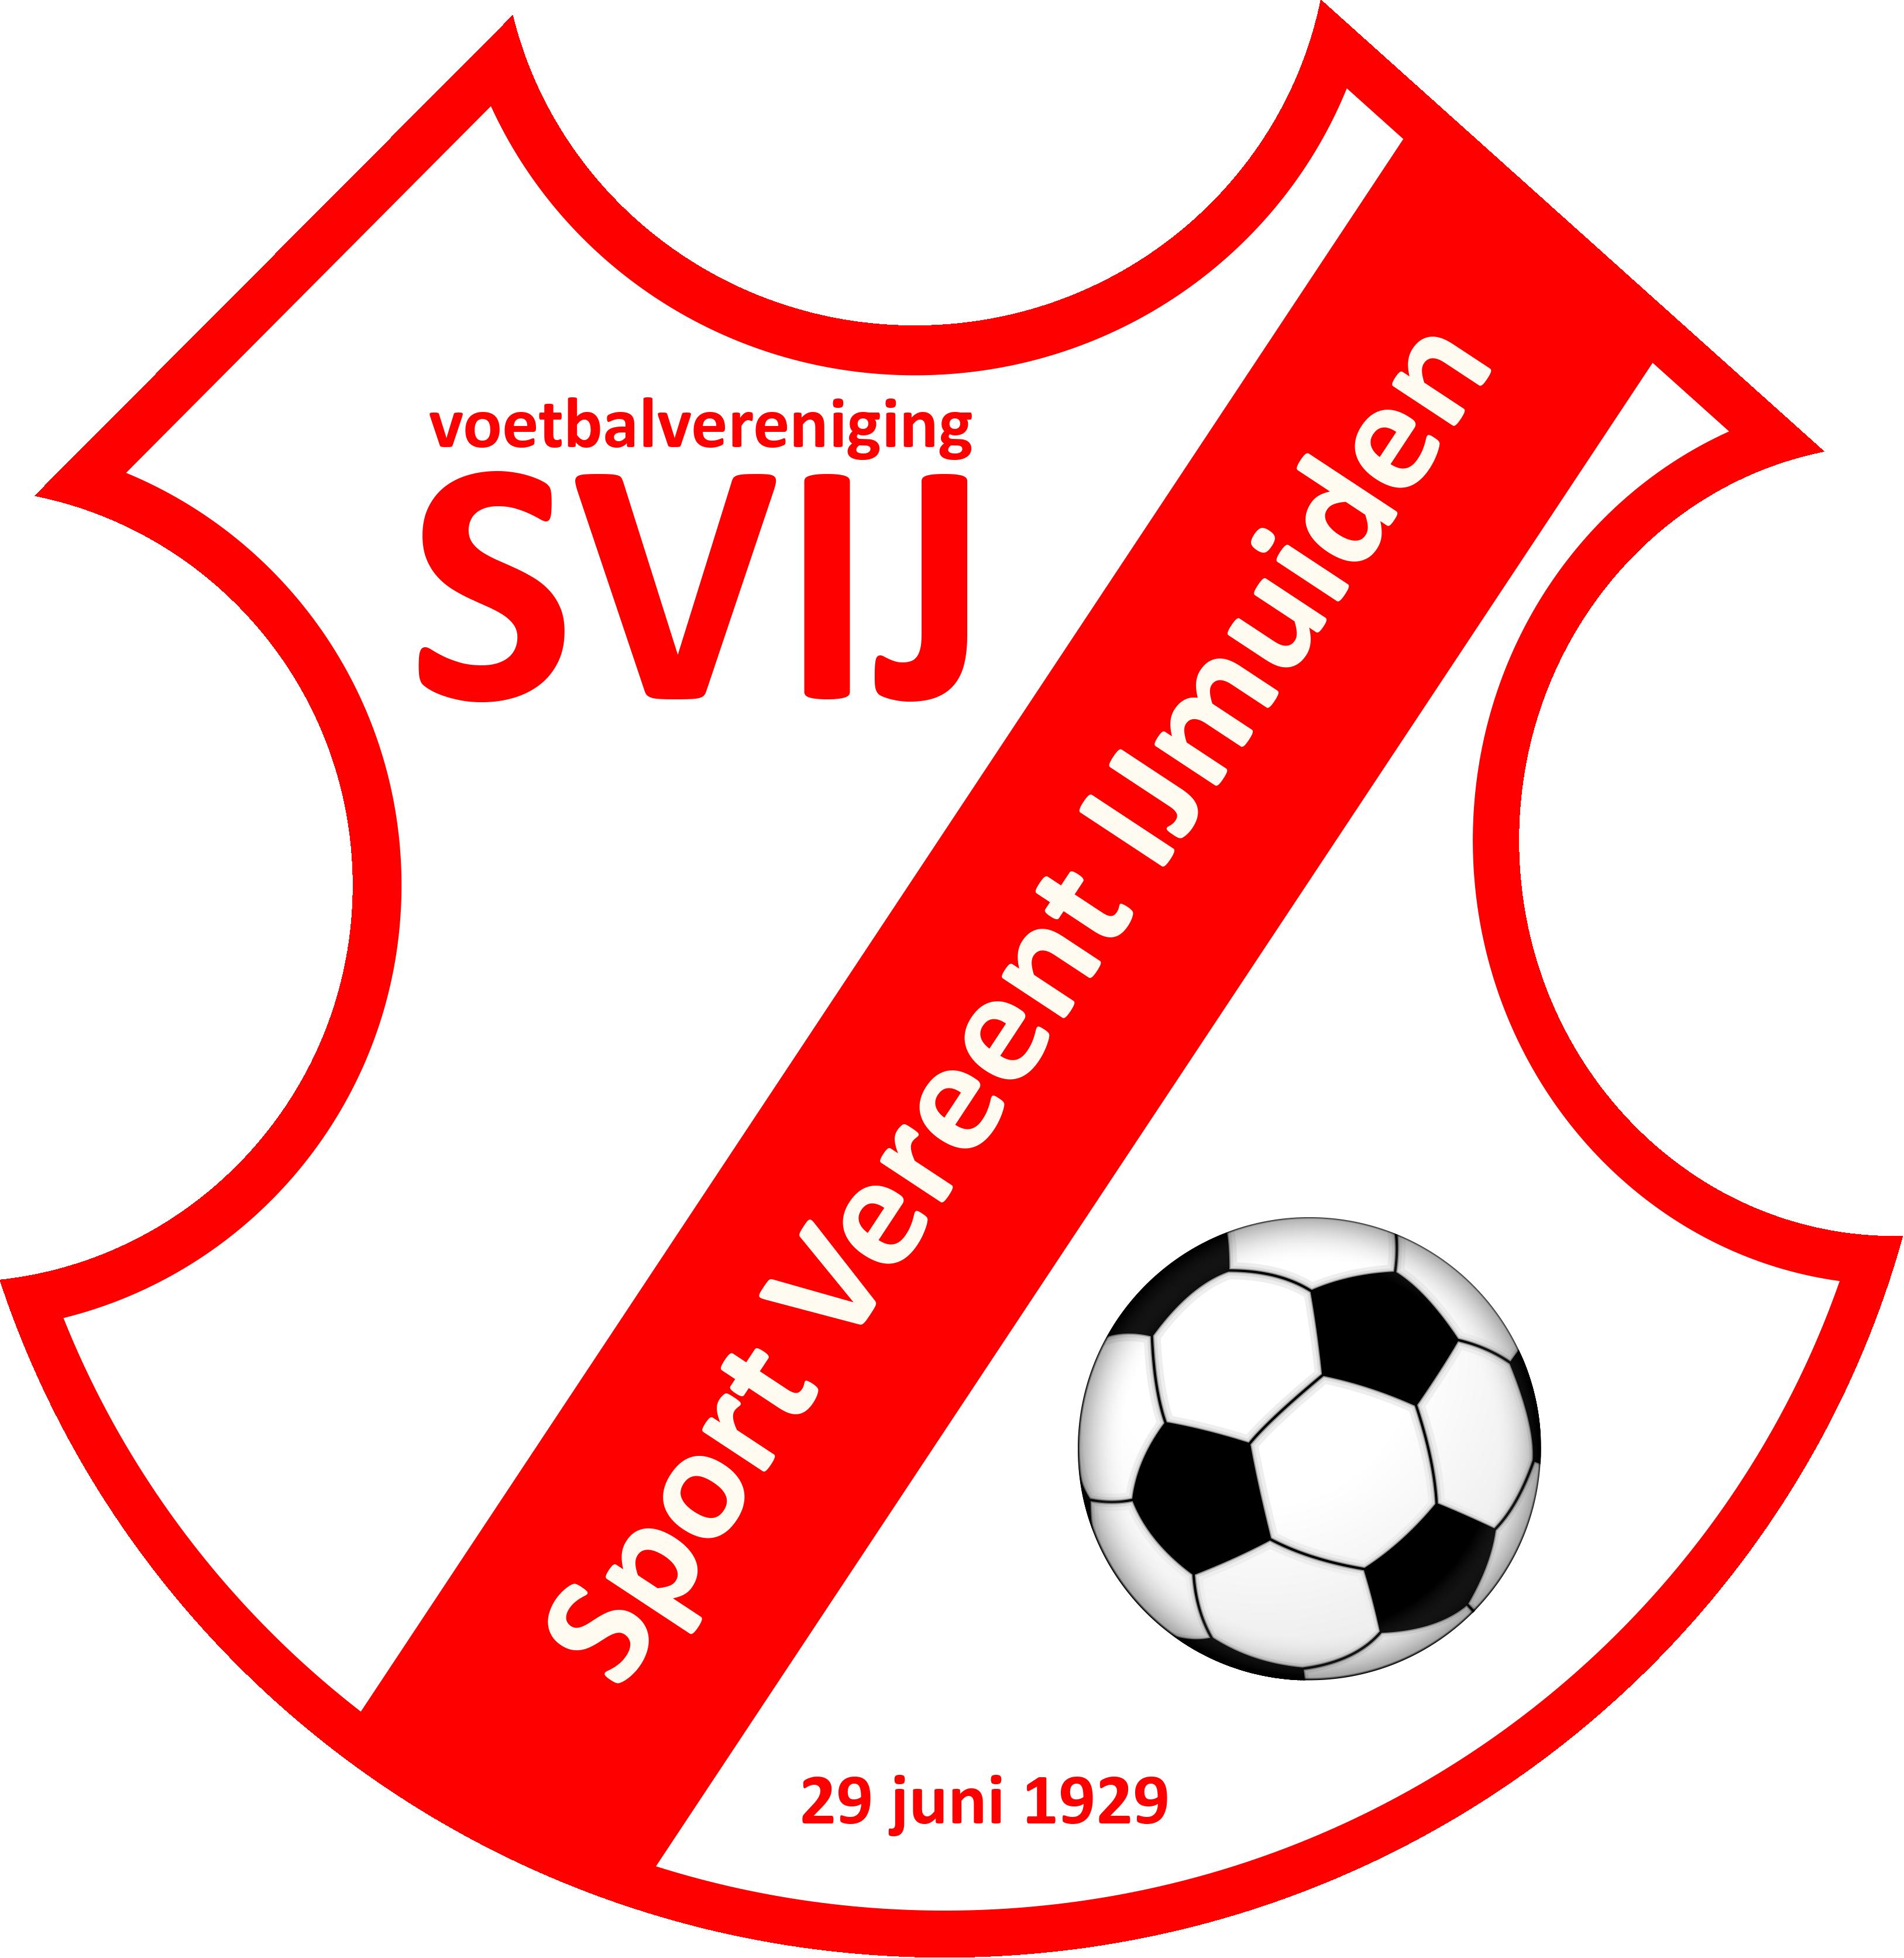 Voetbalvereniging SVIJ